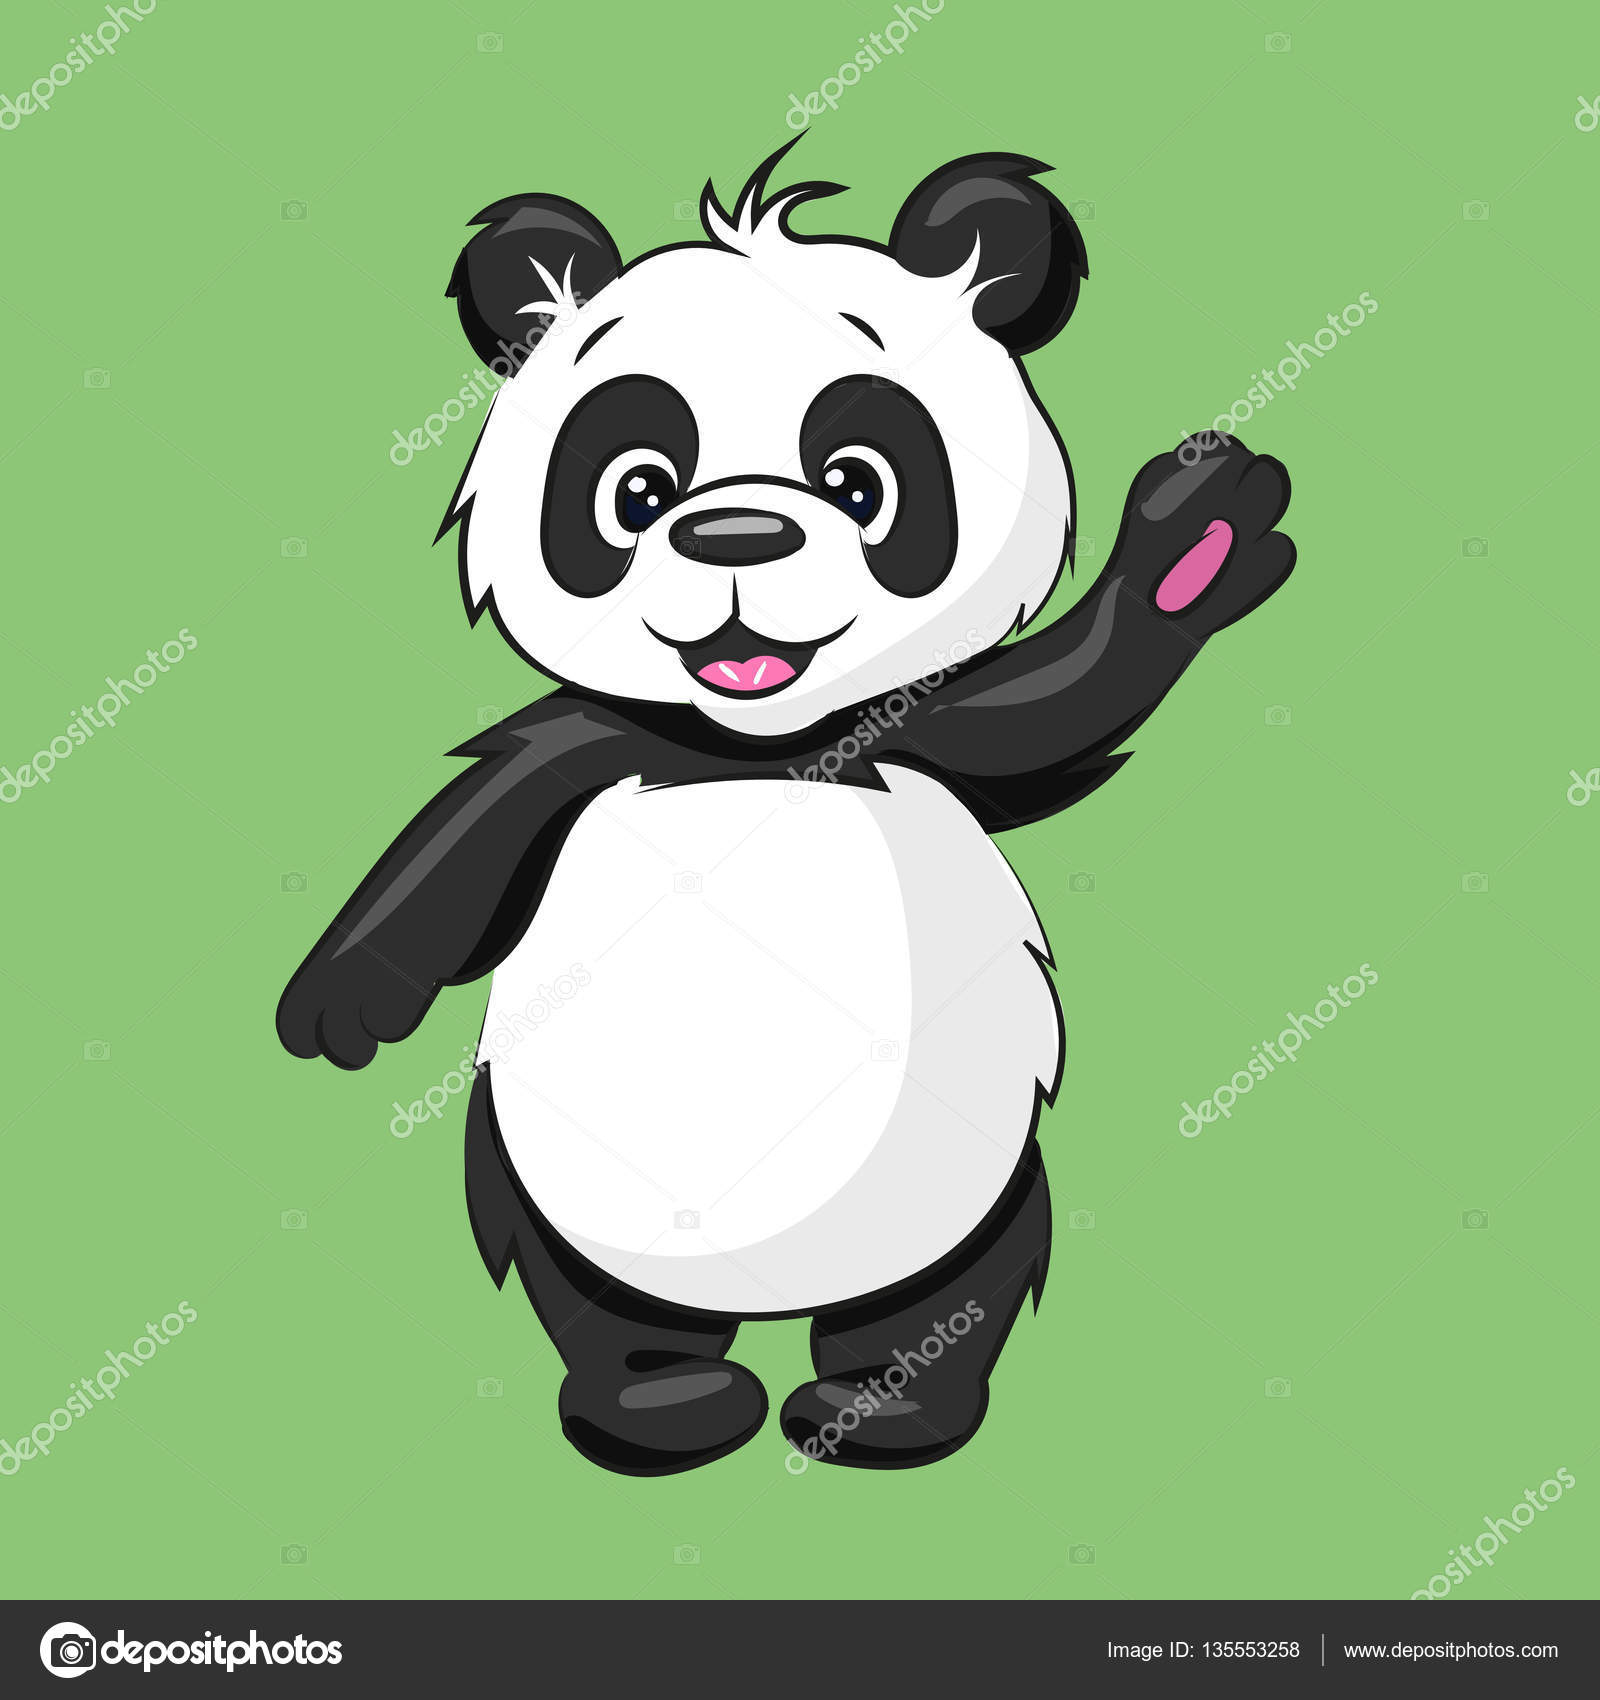 Black And White Cartoon Baby Panda At The White Background